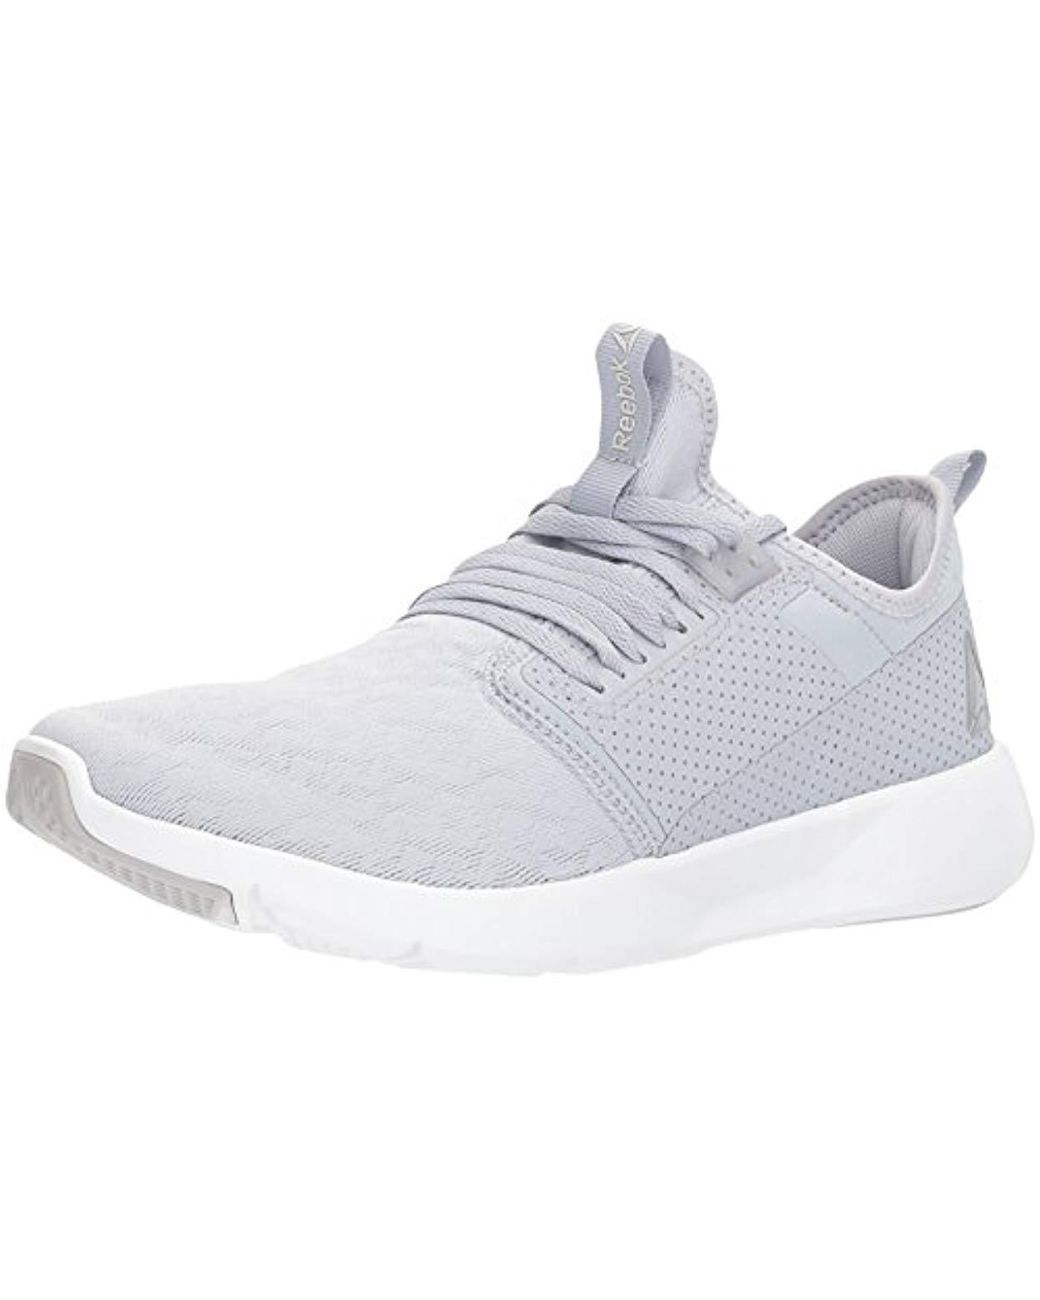 Sneaker Women's 0 Gray Plus 2 Gf Lite tshQrdxBC